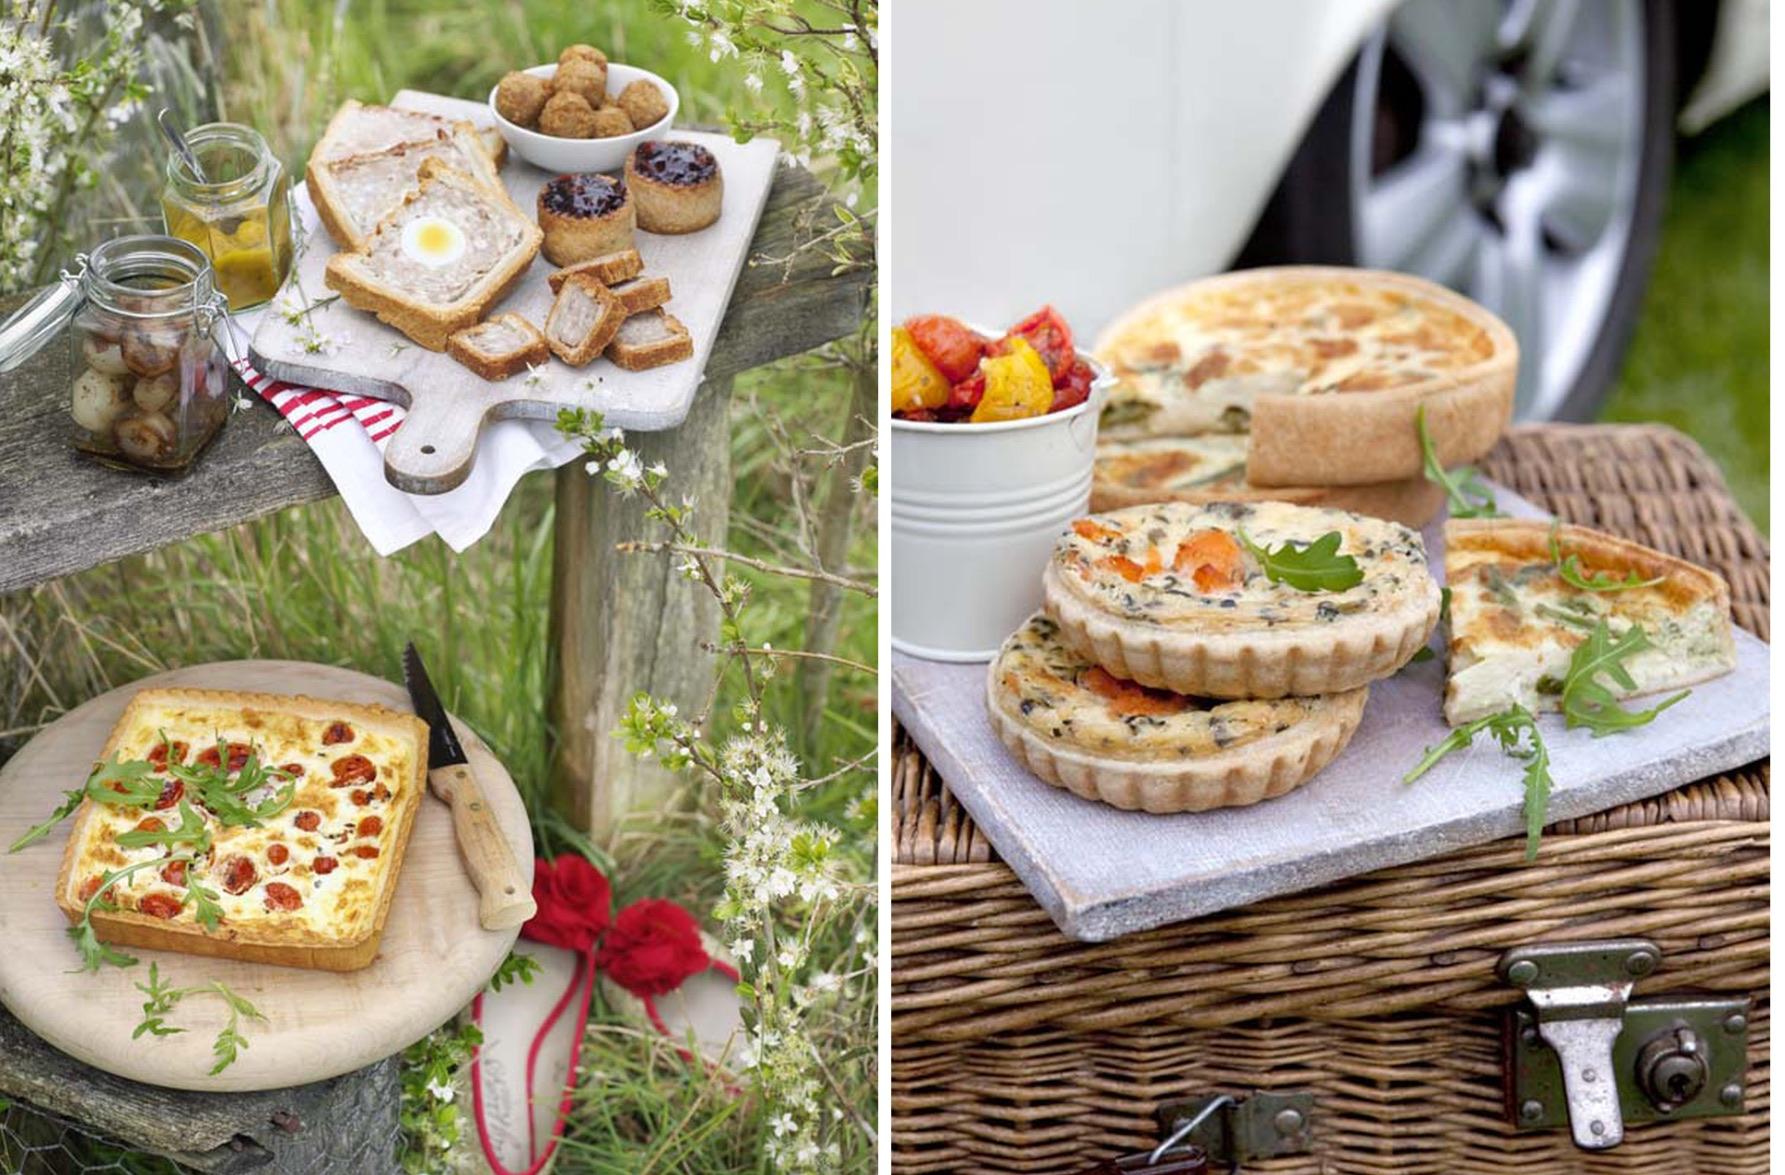 picnic 3 web.jpg